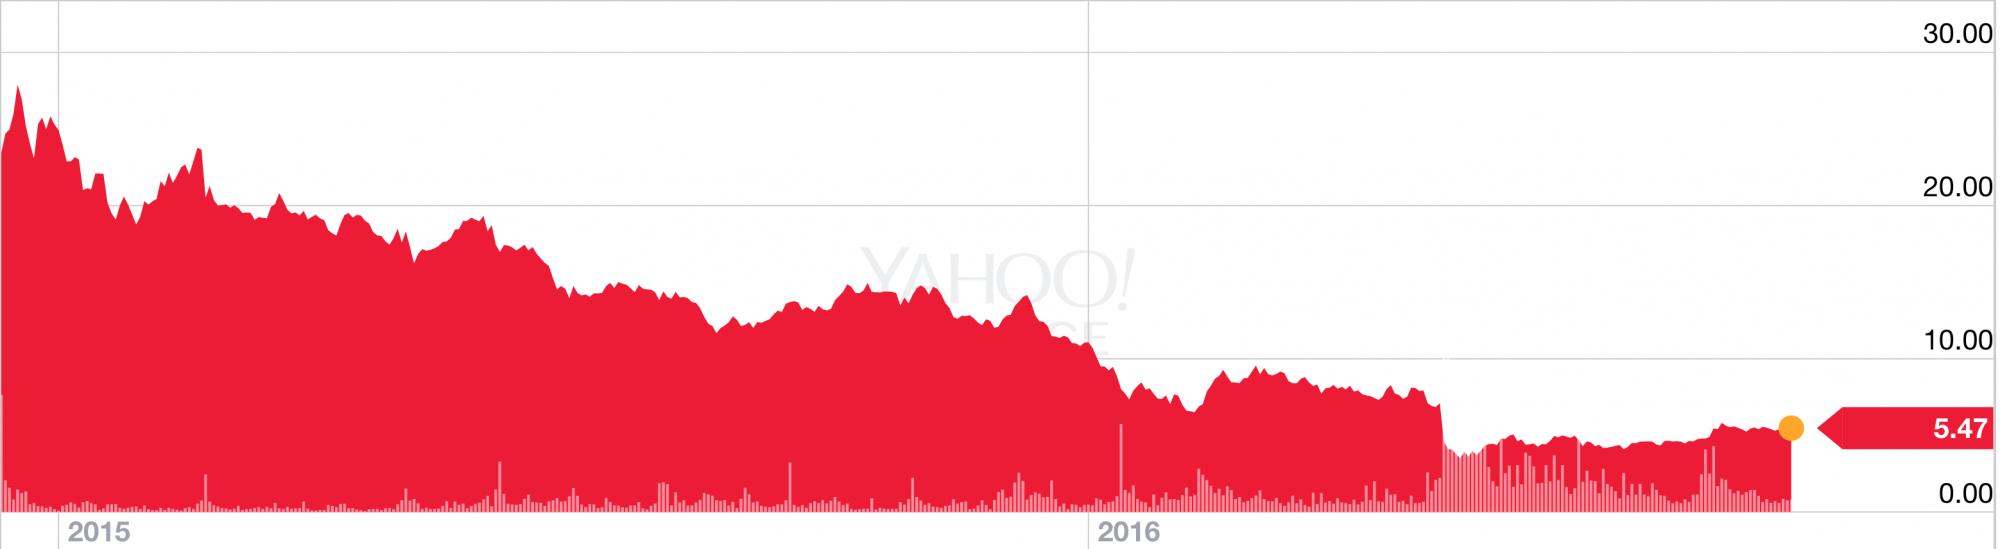 lending-club-stock-price